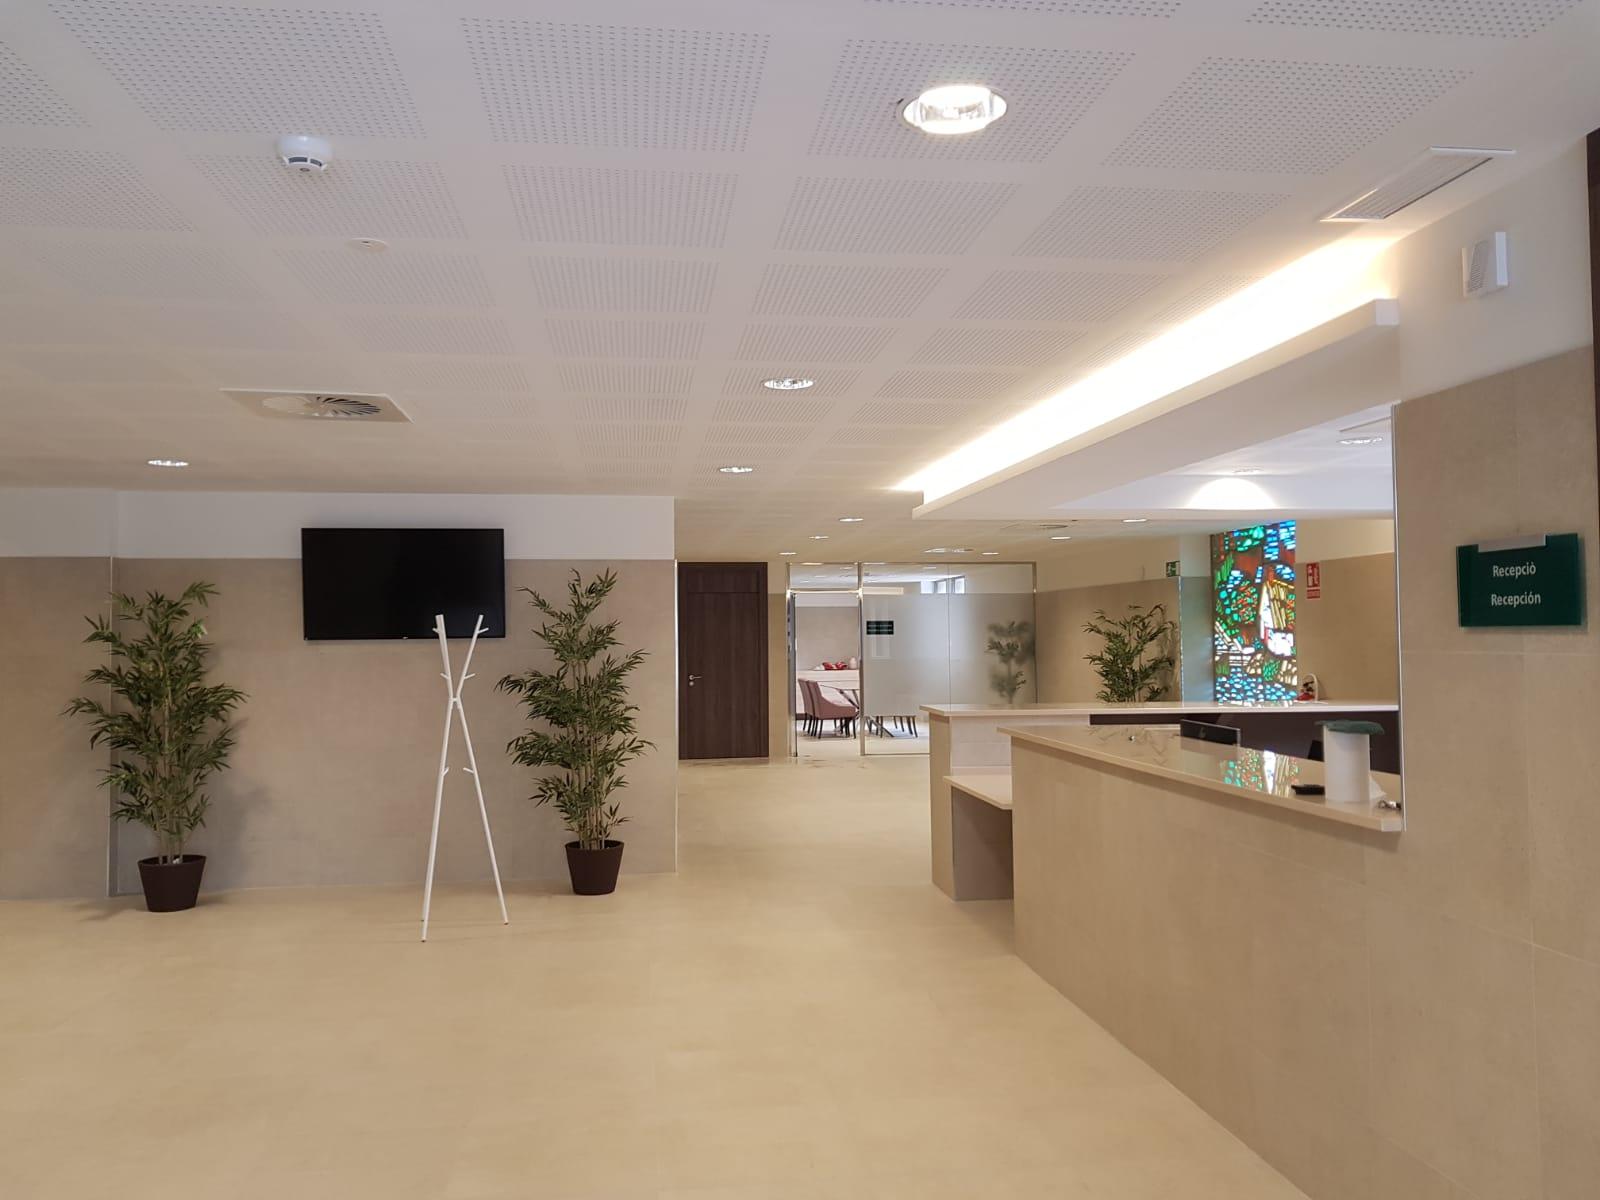 Amplio pasillo en el edificio Funespaña